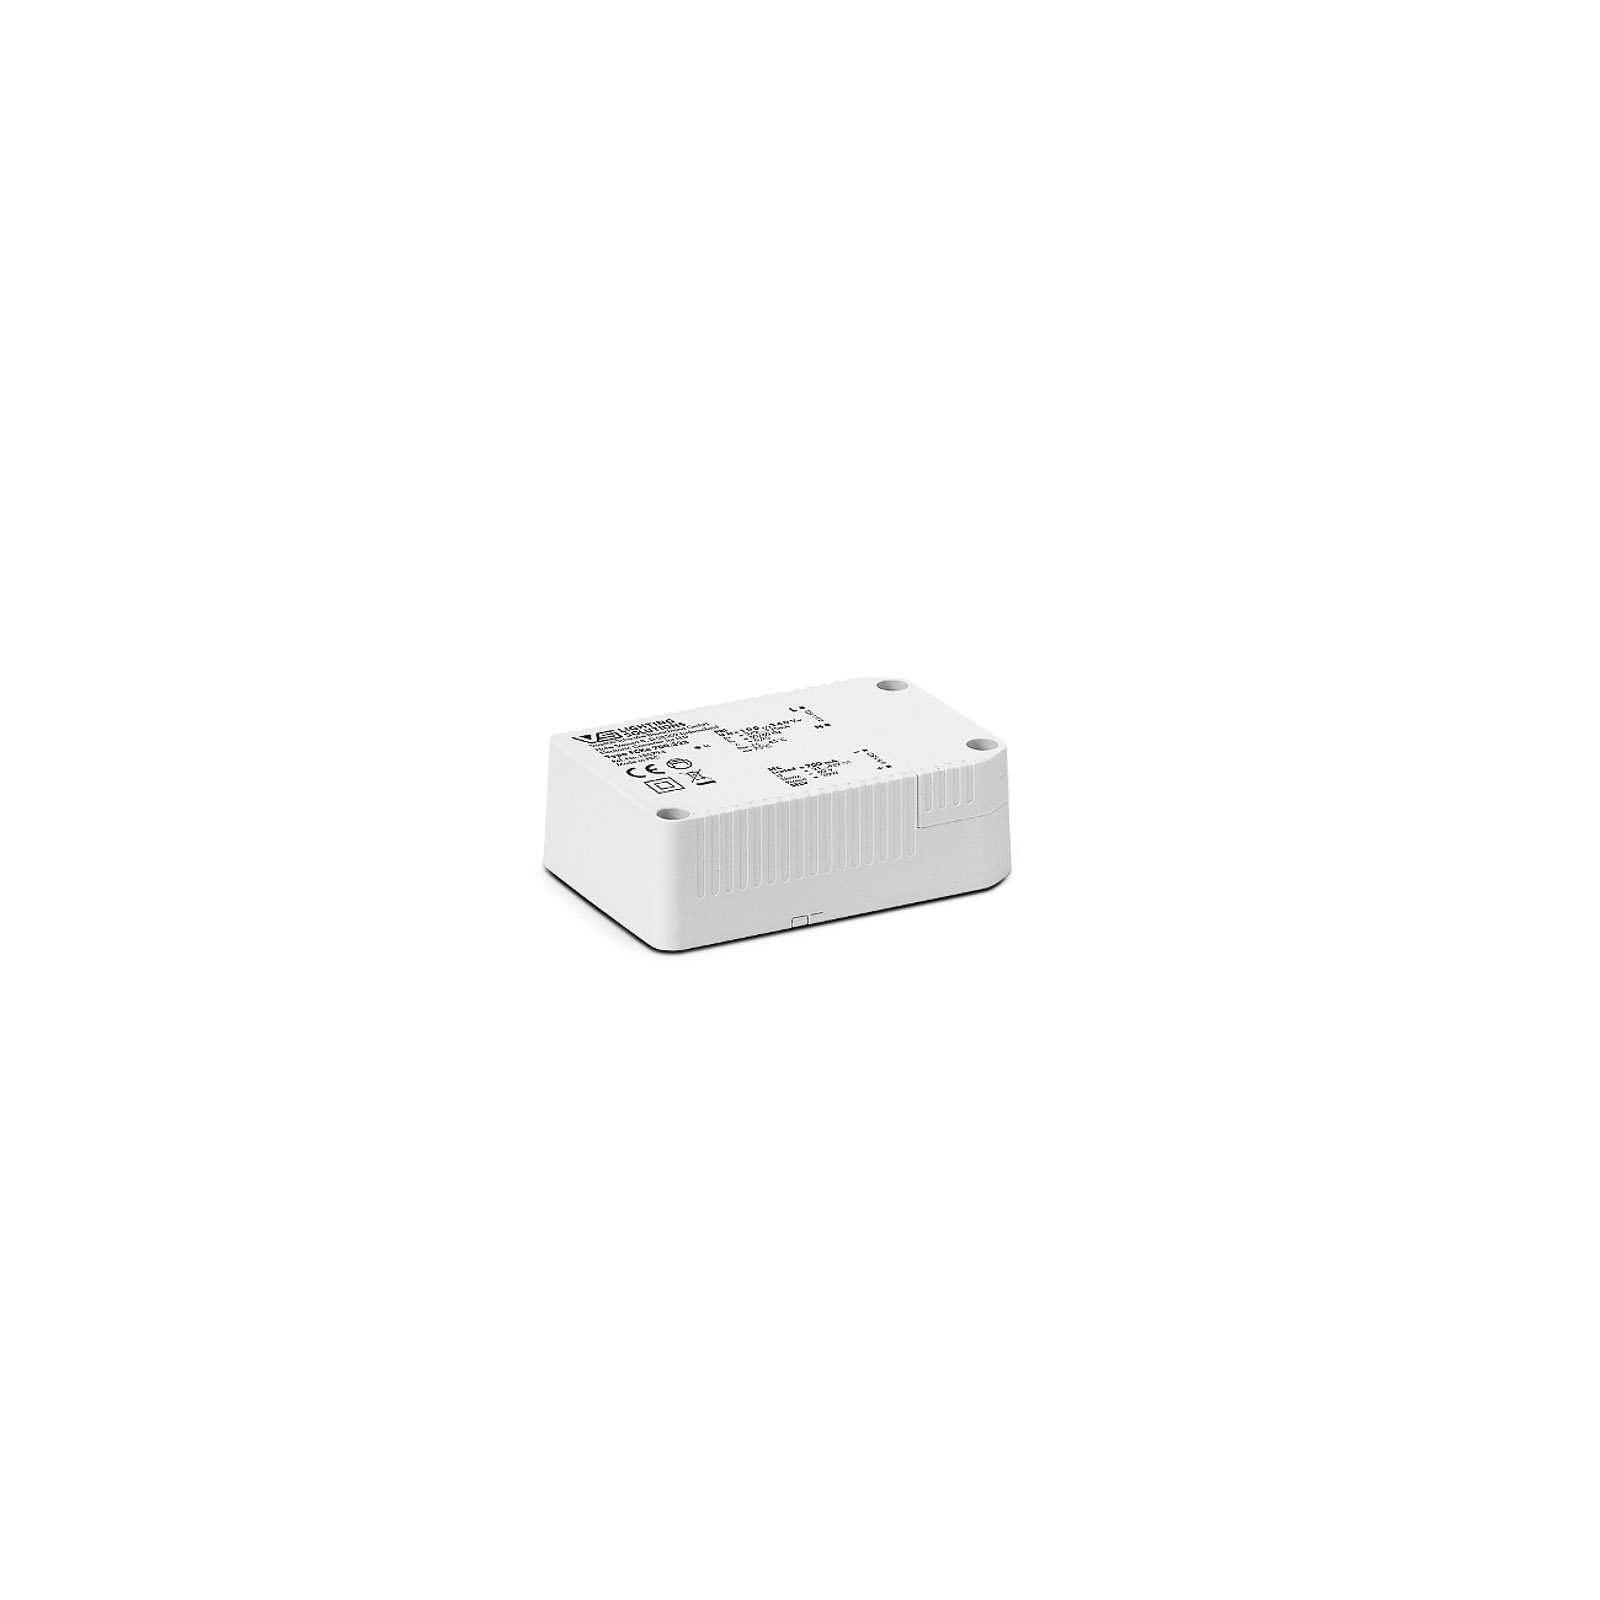 LED driver max. 30 W, 21-43 V DC, 700 mA